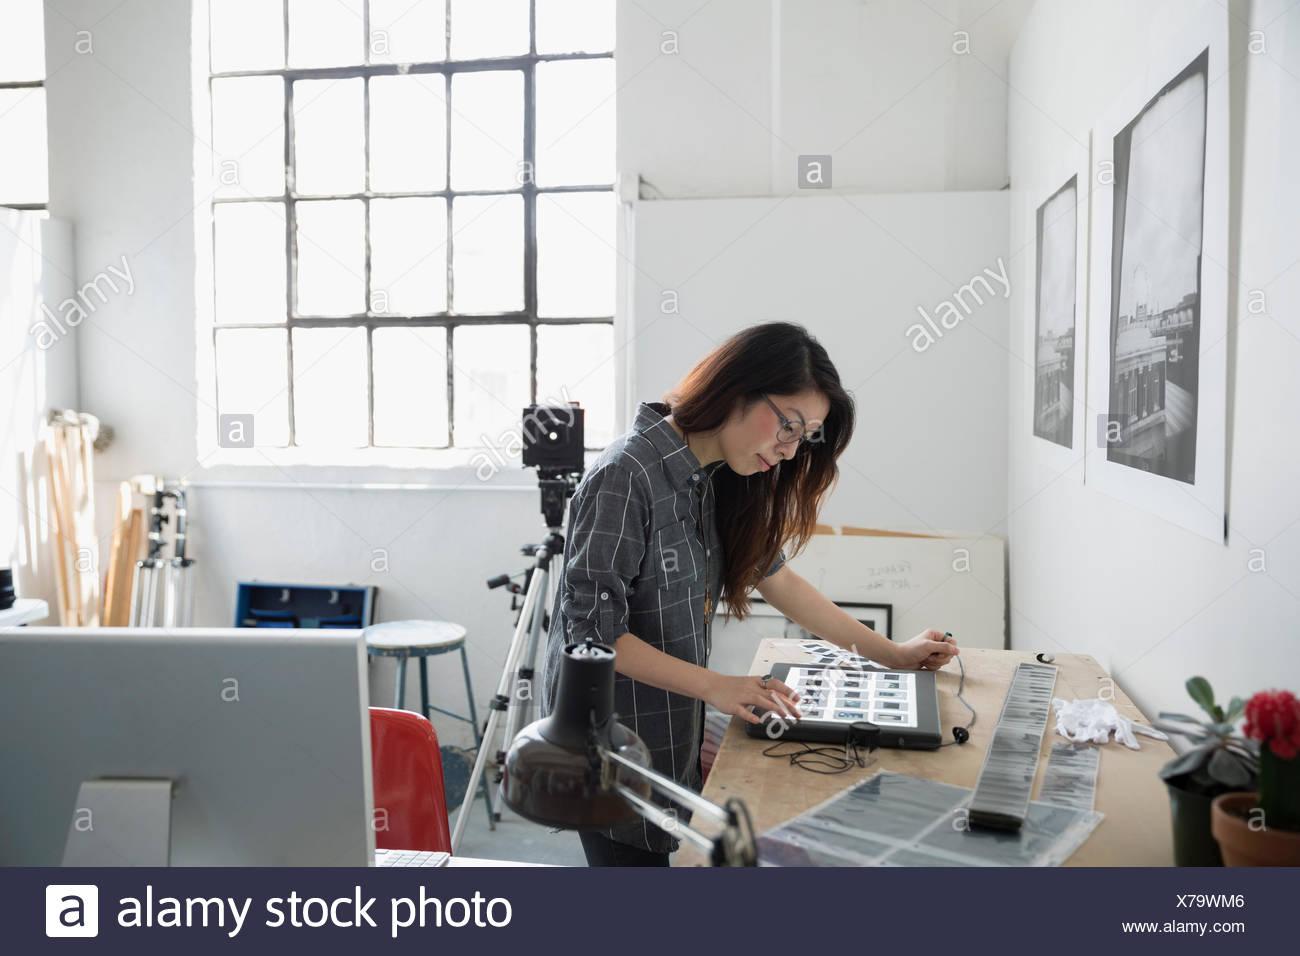 Femme photographe examinant les diapositives en art studio Photo Stock